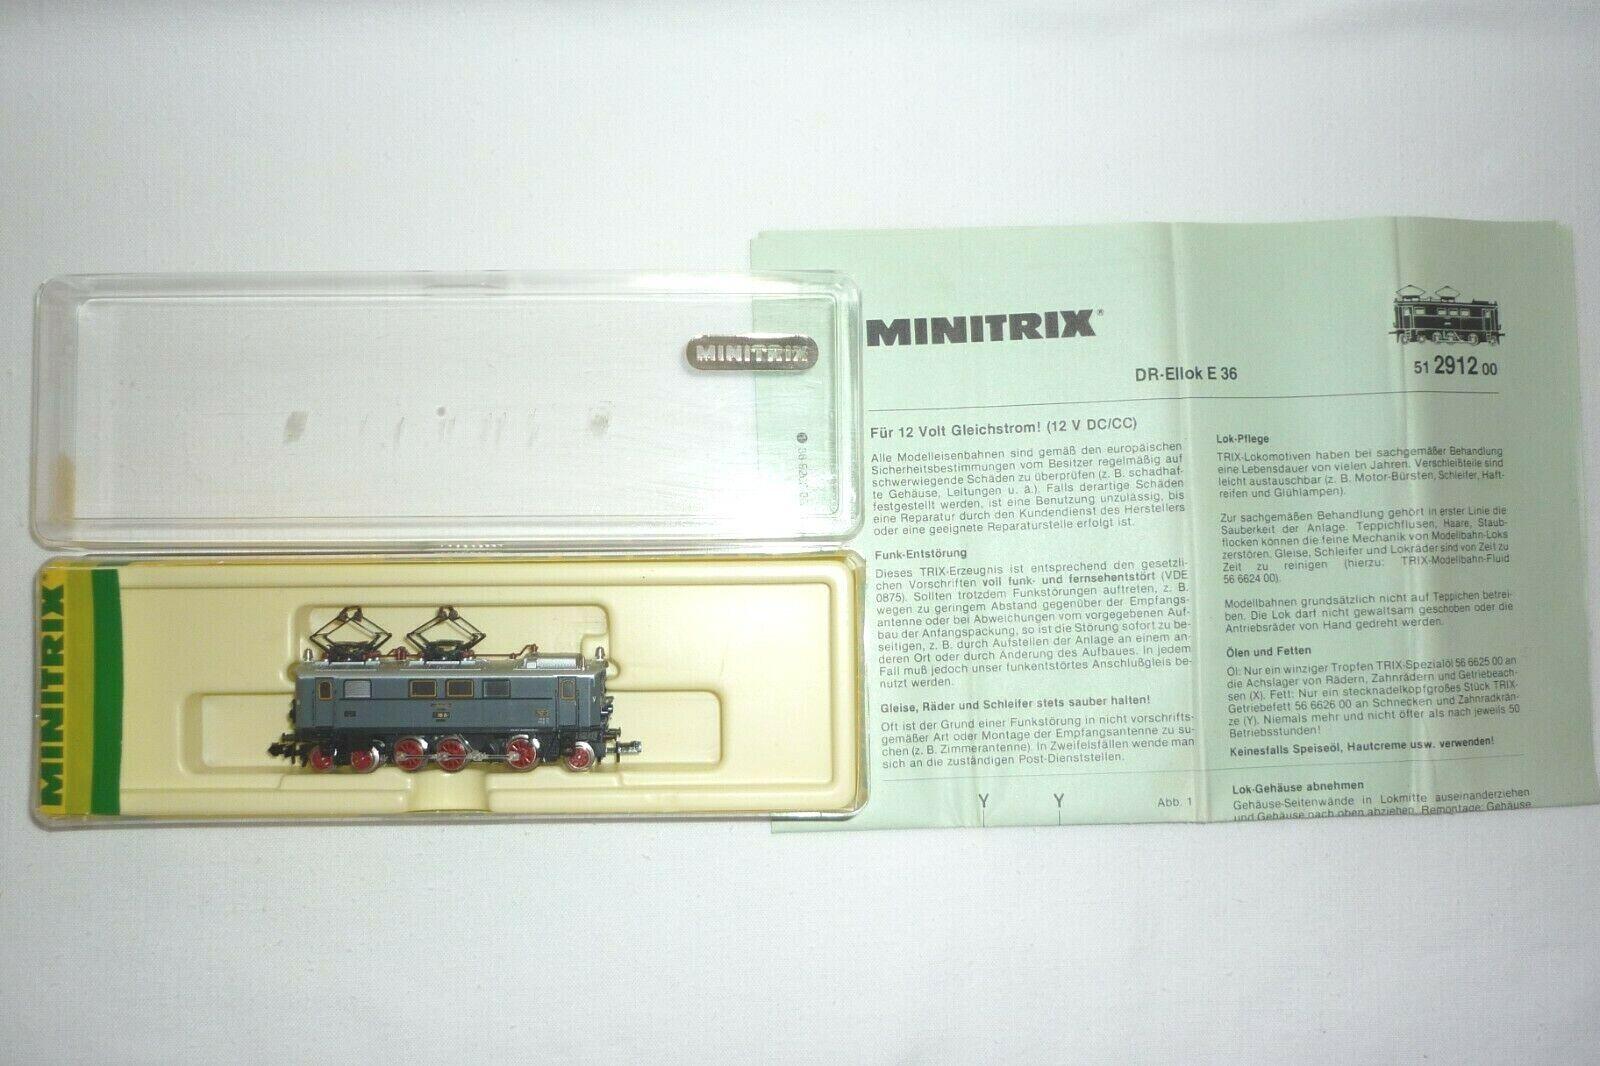 MINITRIX - SPUR N - 51 2912 00 ELEKTROLOK  DR E 36 02  OVP (15.EI-61)